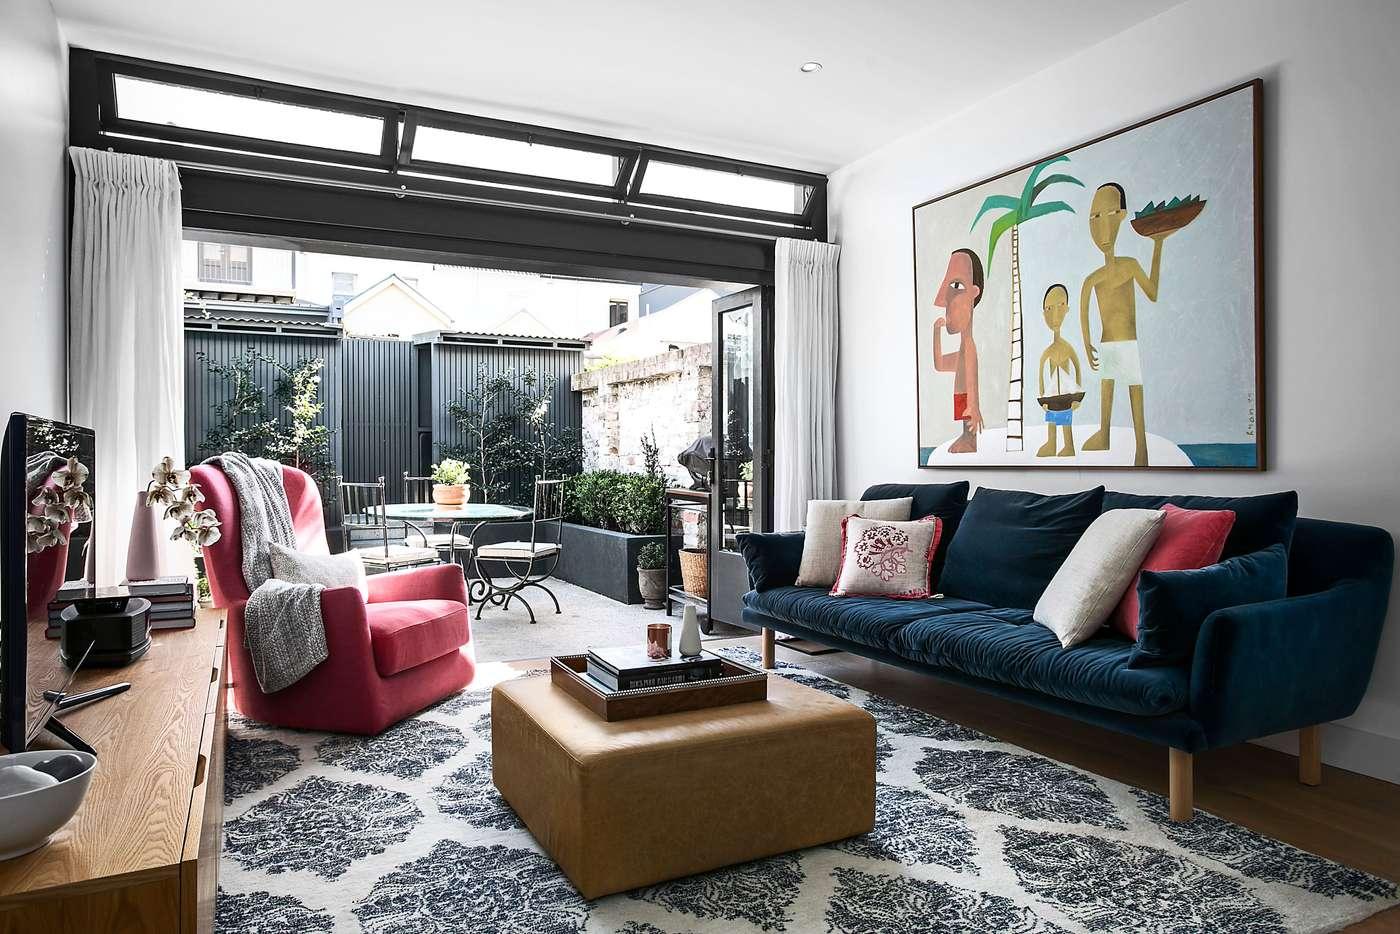 Main view of Homely house listing, 32 Cascade Street, Paddington NSW 2021